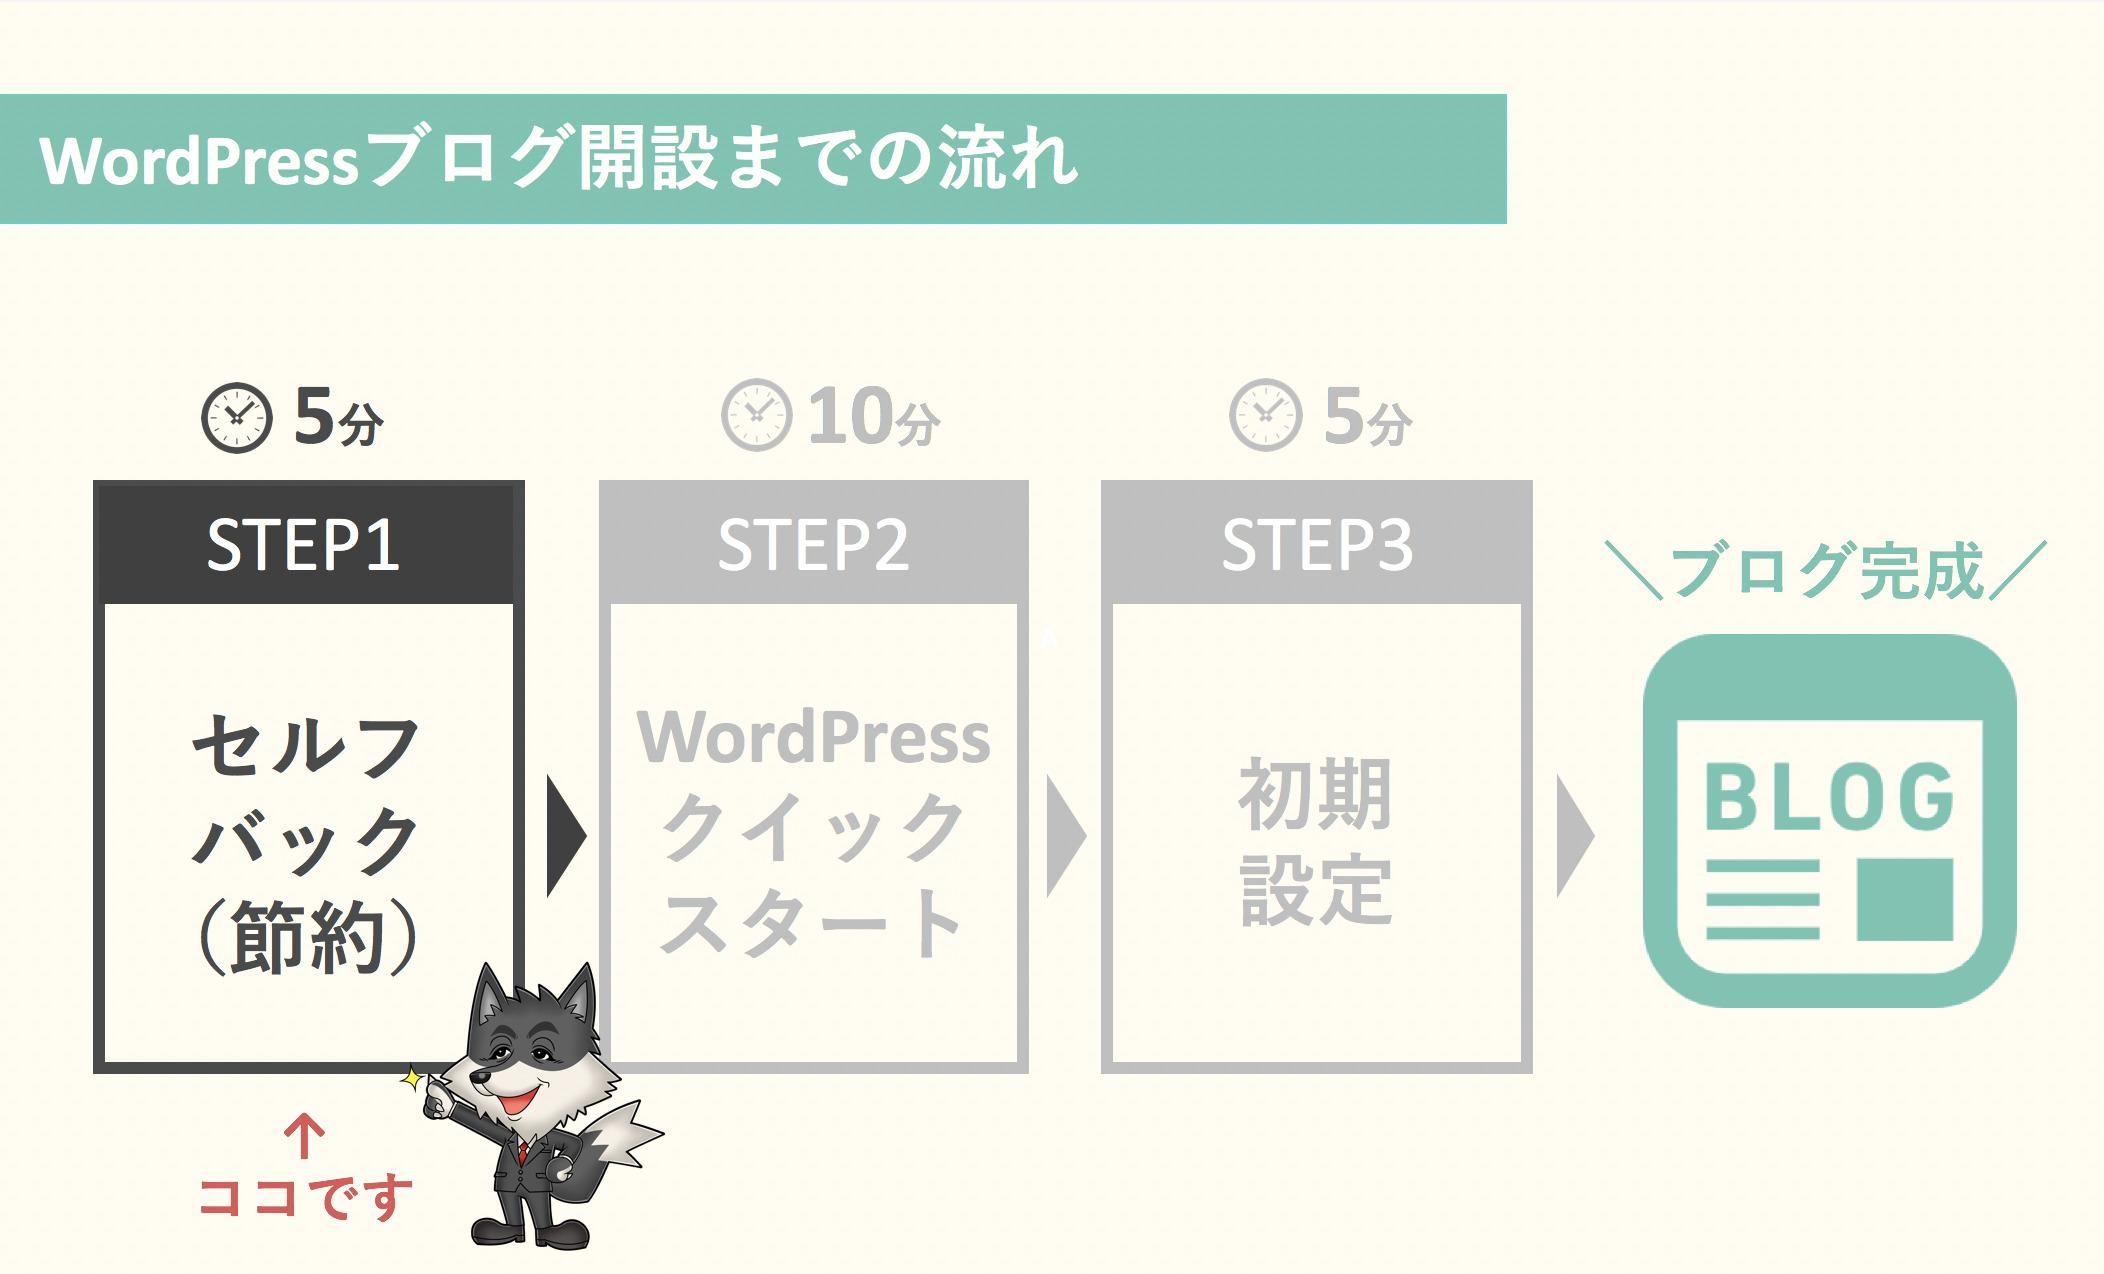 STEP1:セルフバックの準備【ブログ開設の初期費用をキャッシュバック】